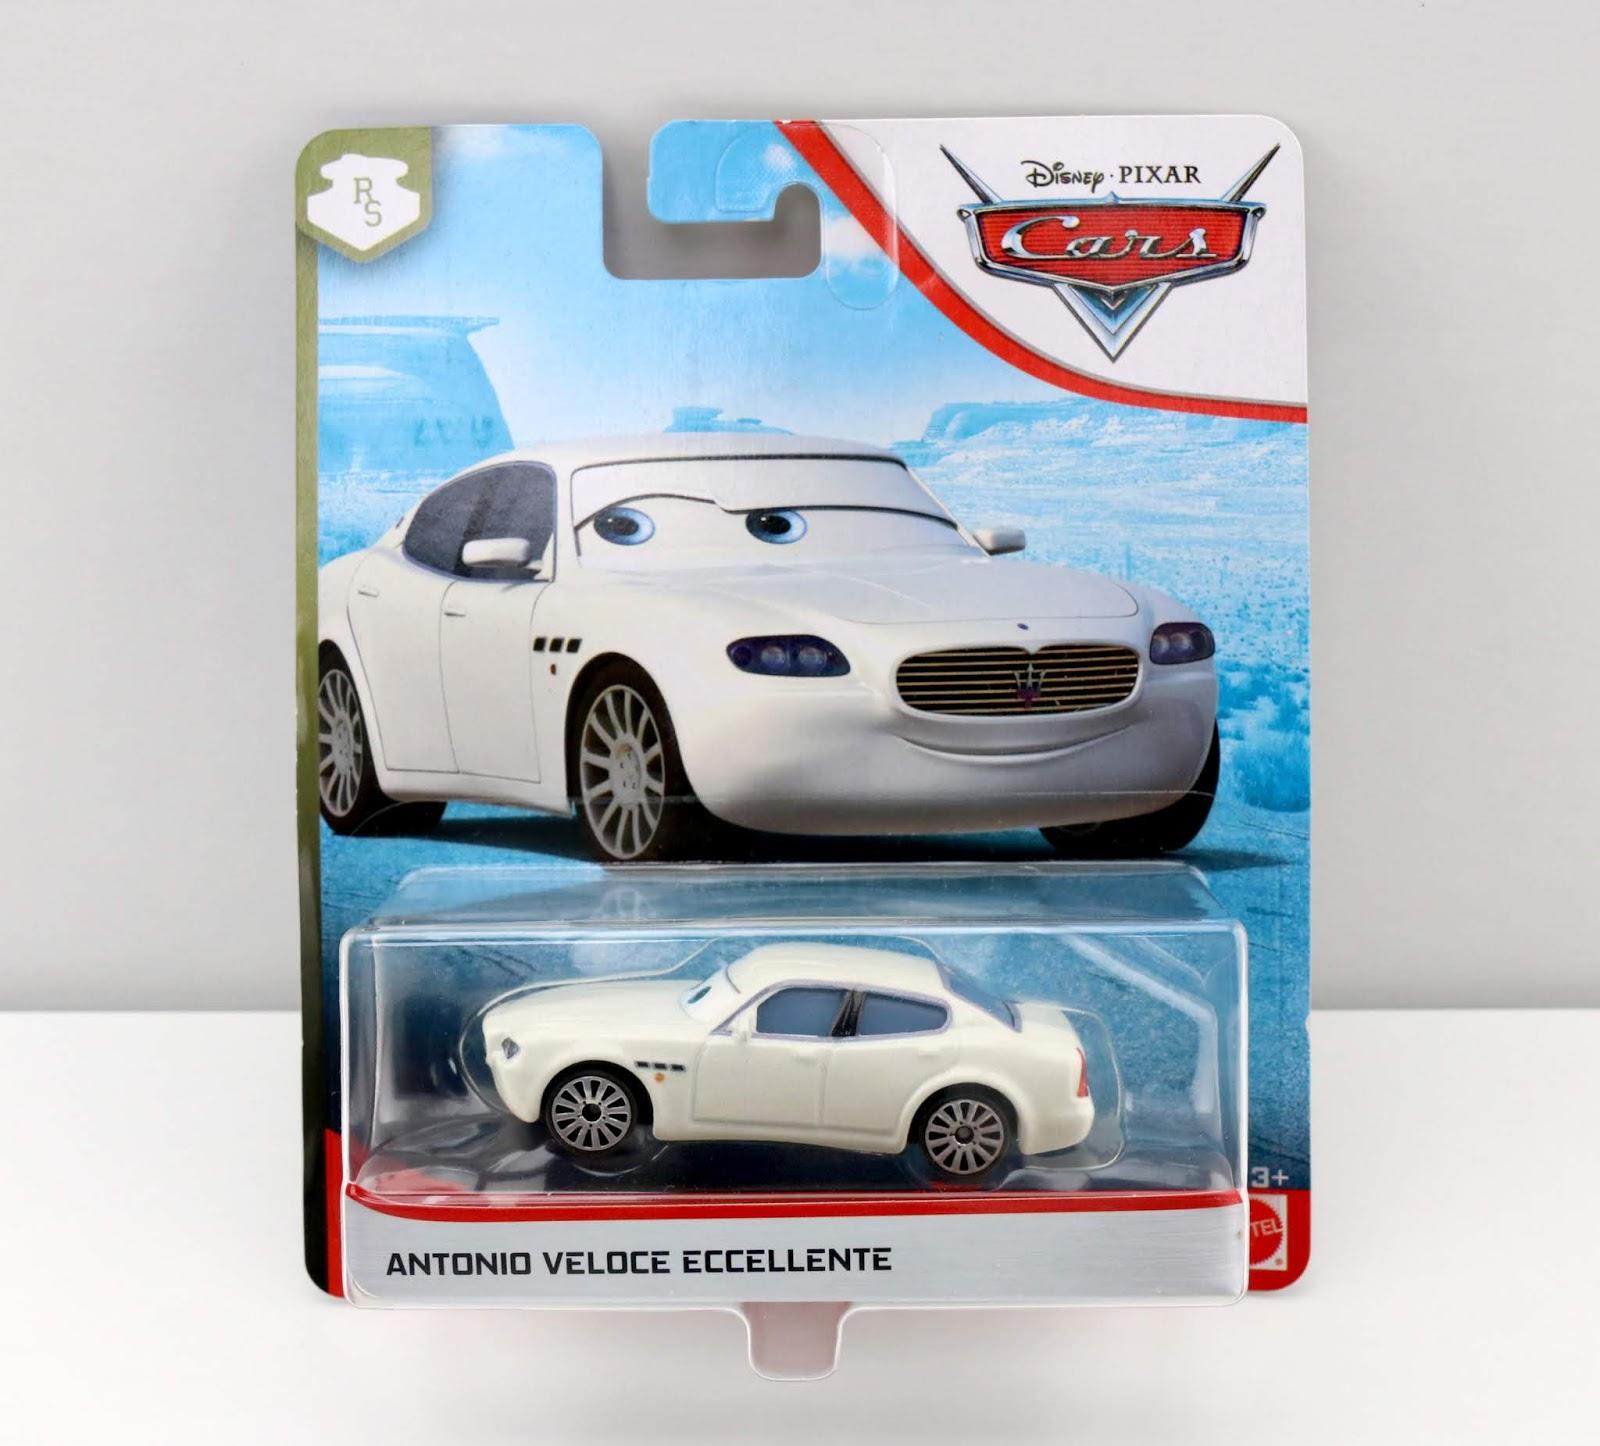 Cars Antonio Veloce Eccellente diecast